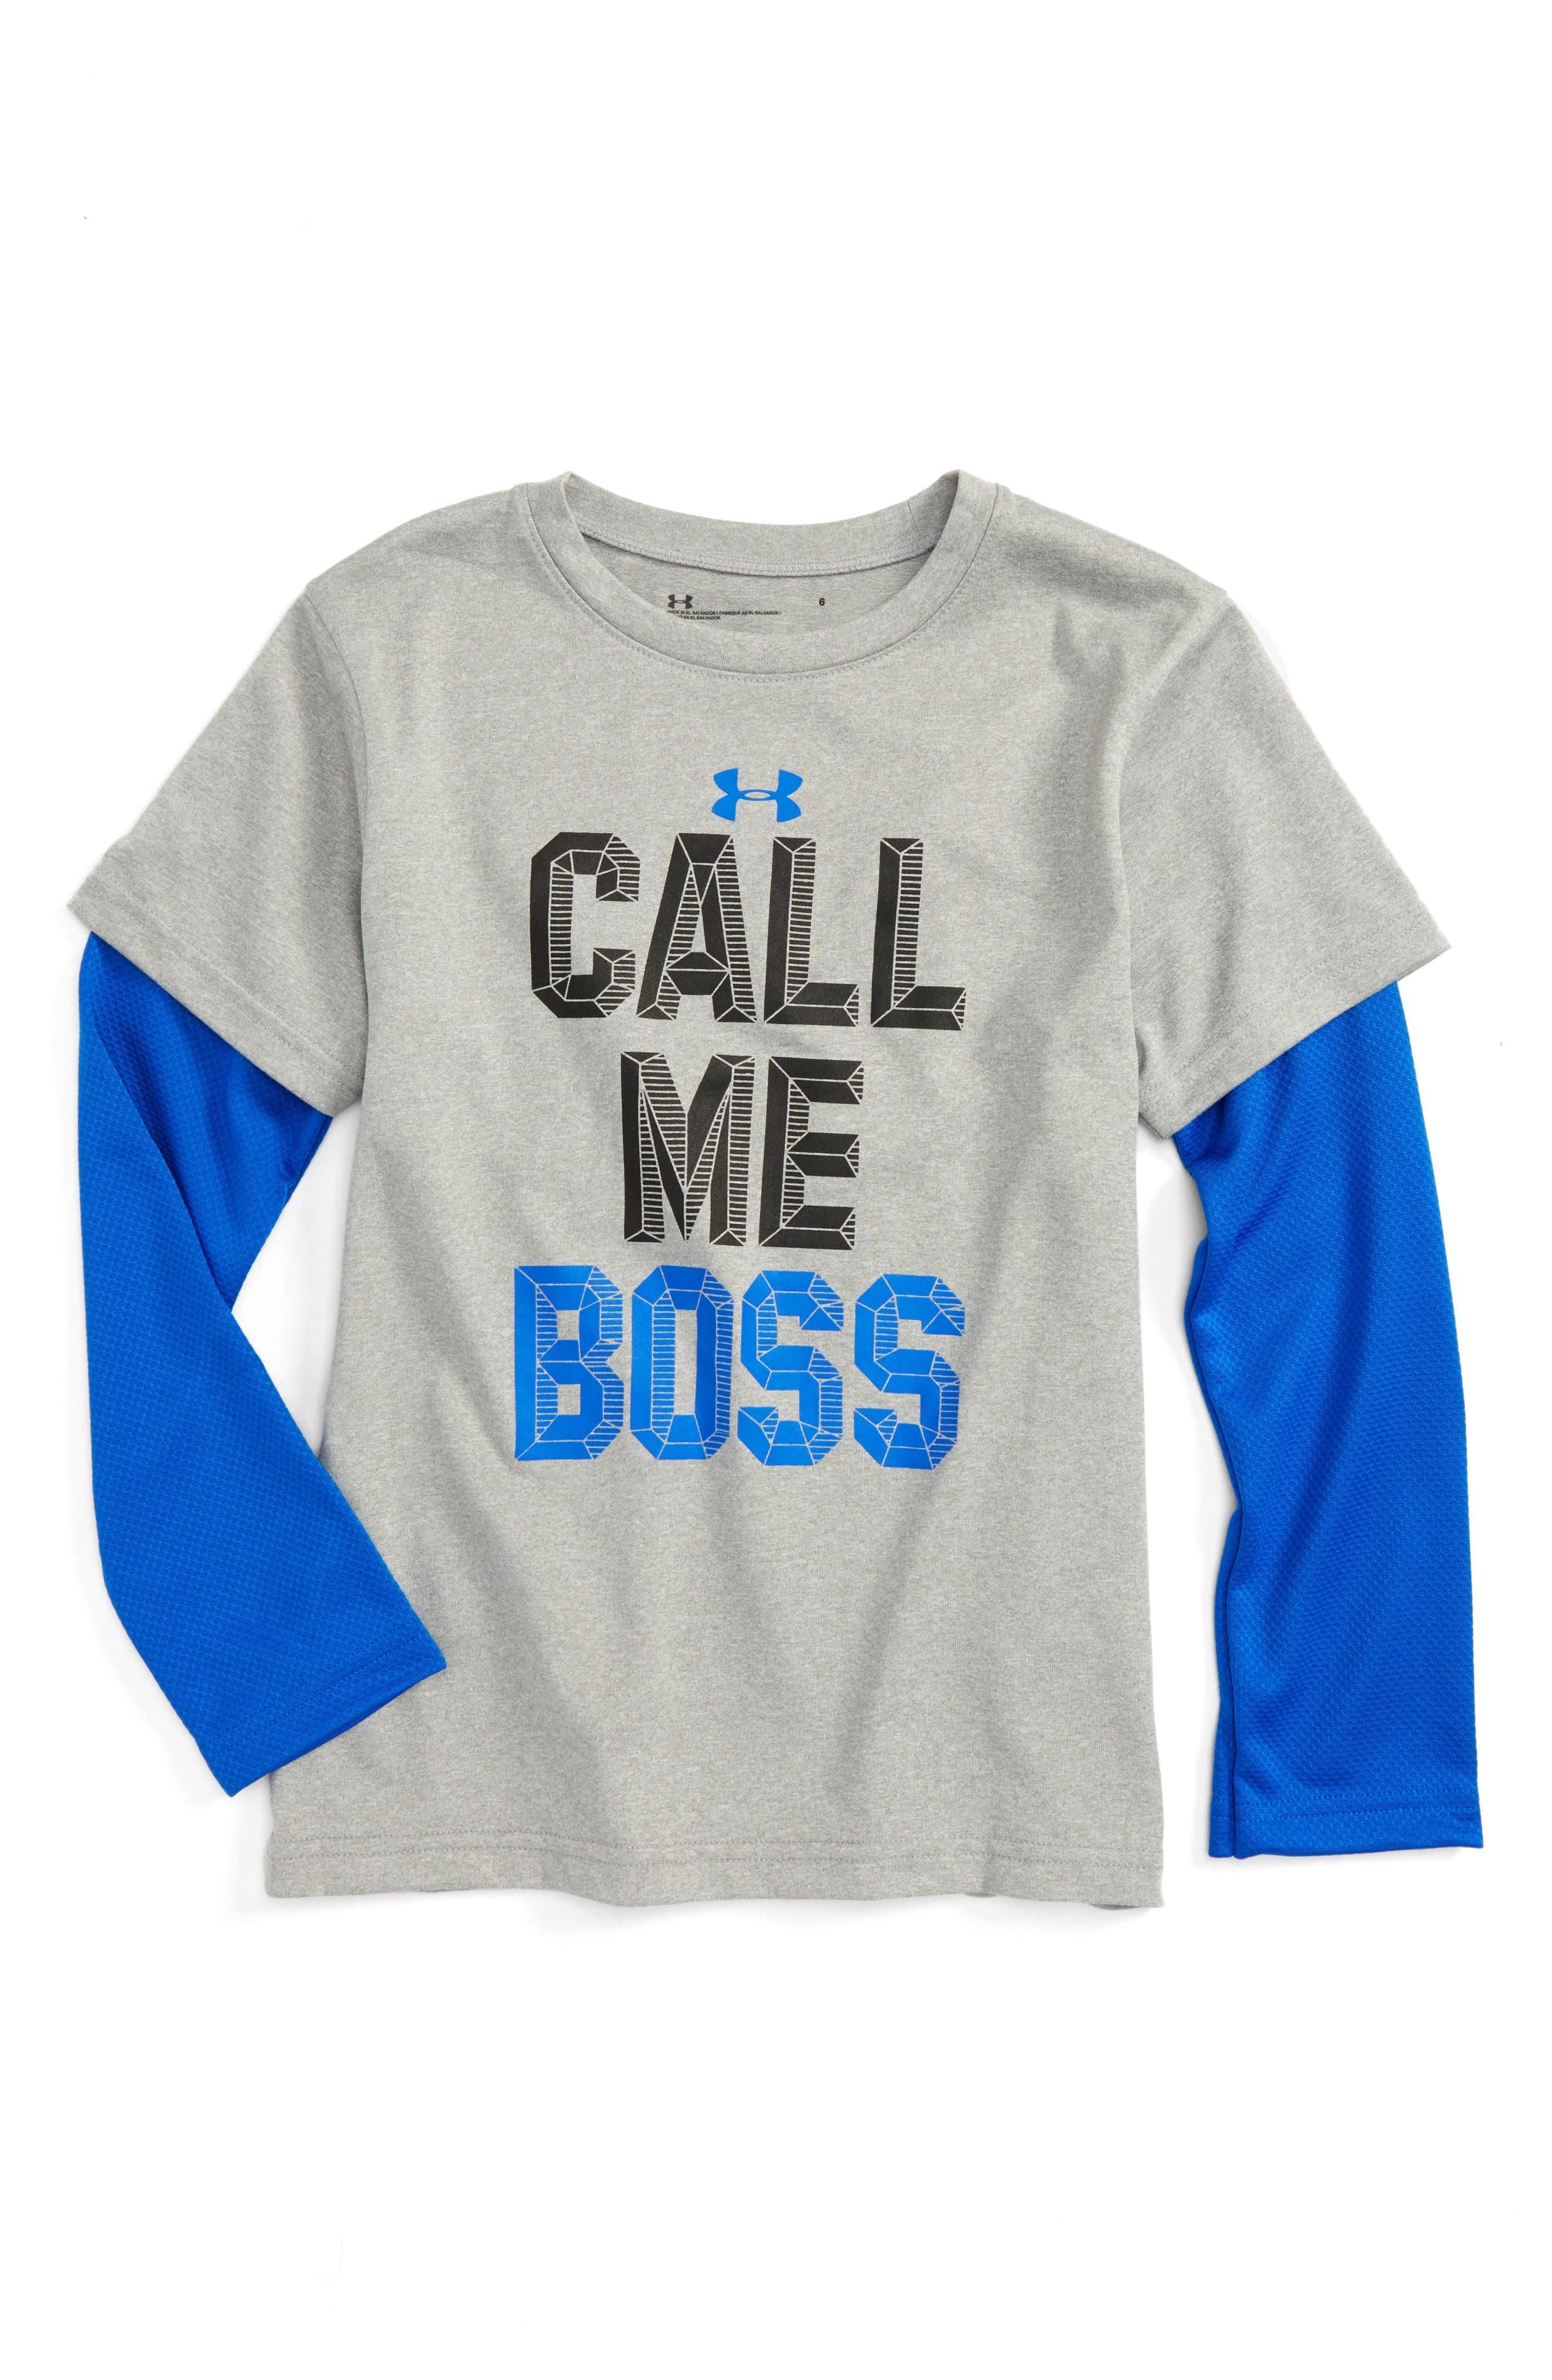 Under Armour Call Me Boss - Slider Layered T-Shirt (Toddler Boys & Little Boys)